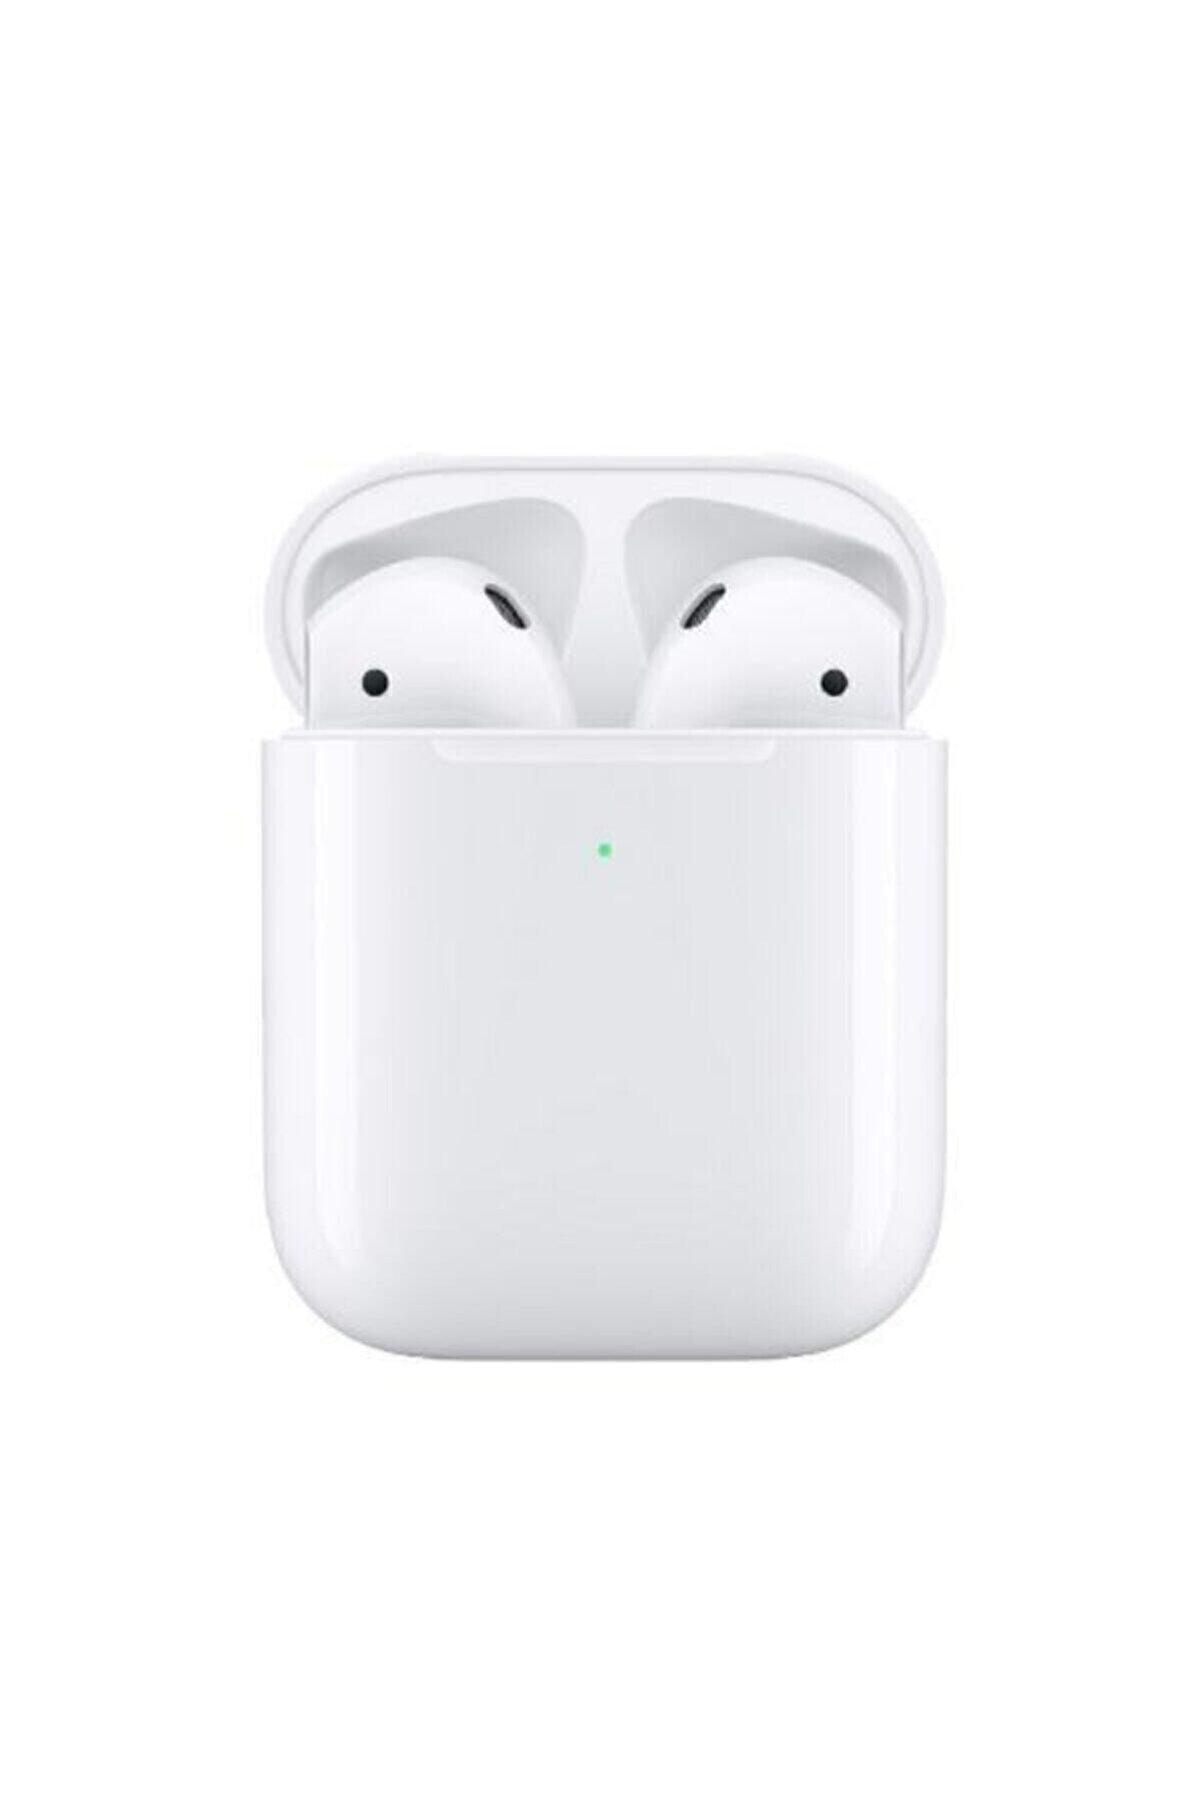 REON Beyaz Airpods 2.Nesil İphone Android Uyumlu Bluetooth Kulaklık